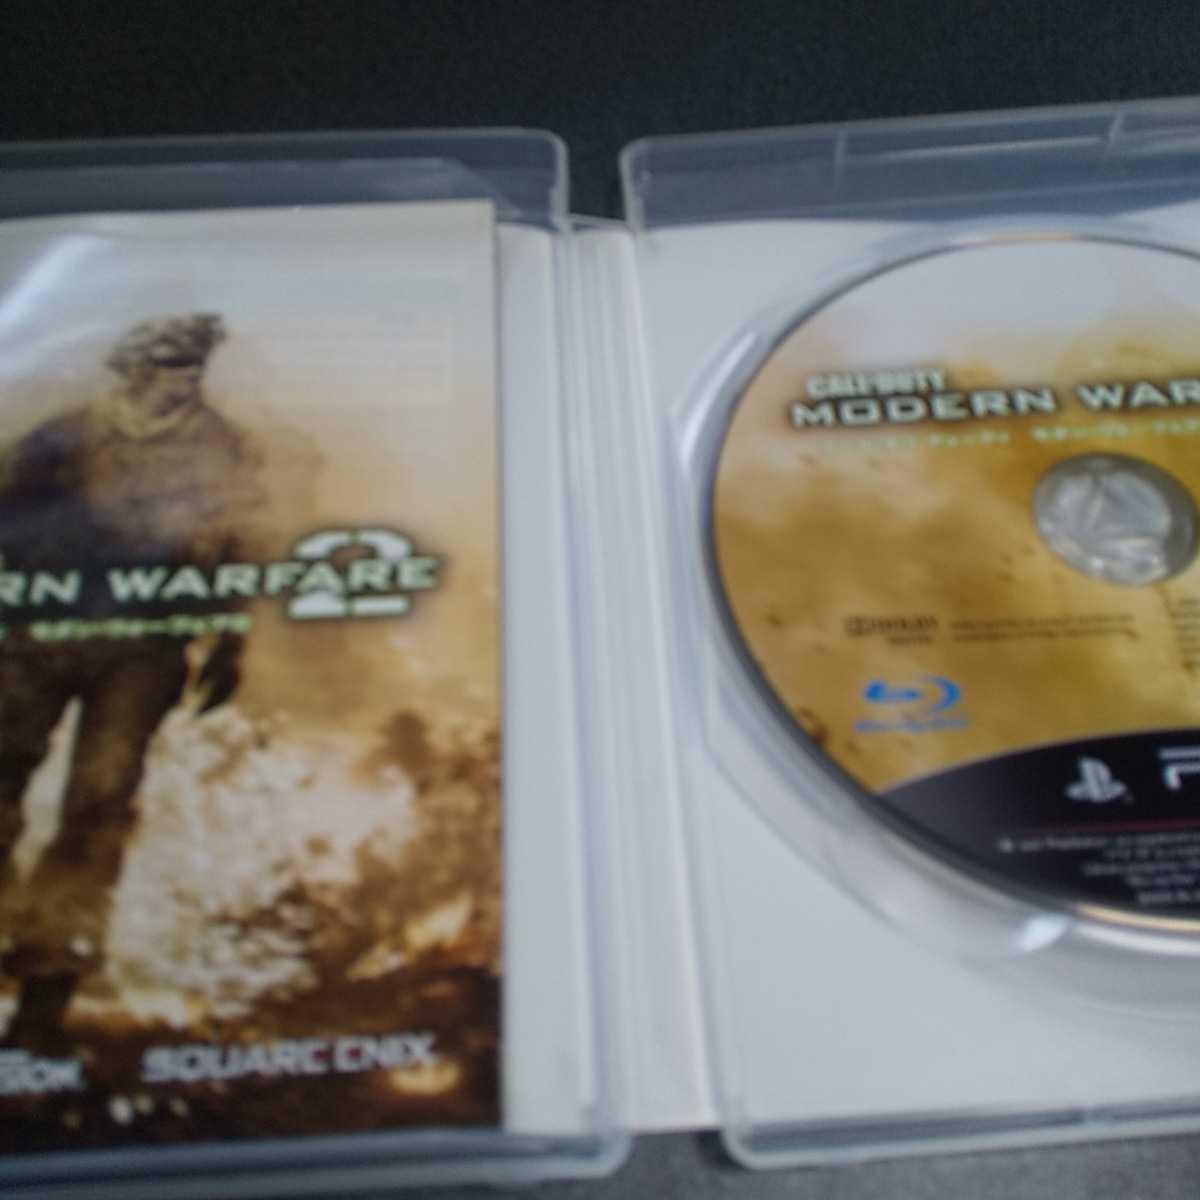 PS3【コールオブデューティ/モダン・ウォーフェア2】2009年スクウェア・エニックス ※暴力・グロテスクシーンあり[送料無料返金保証あり